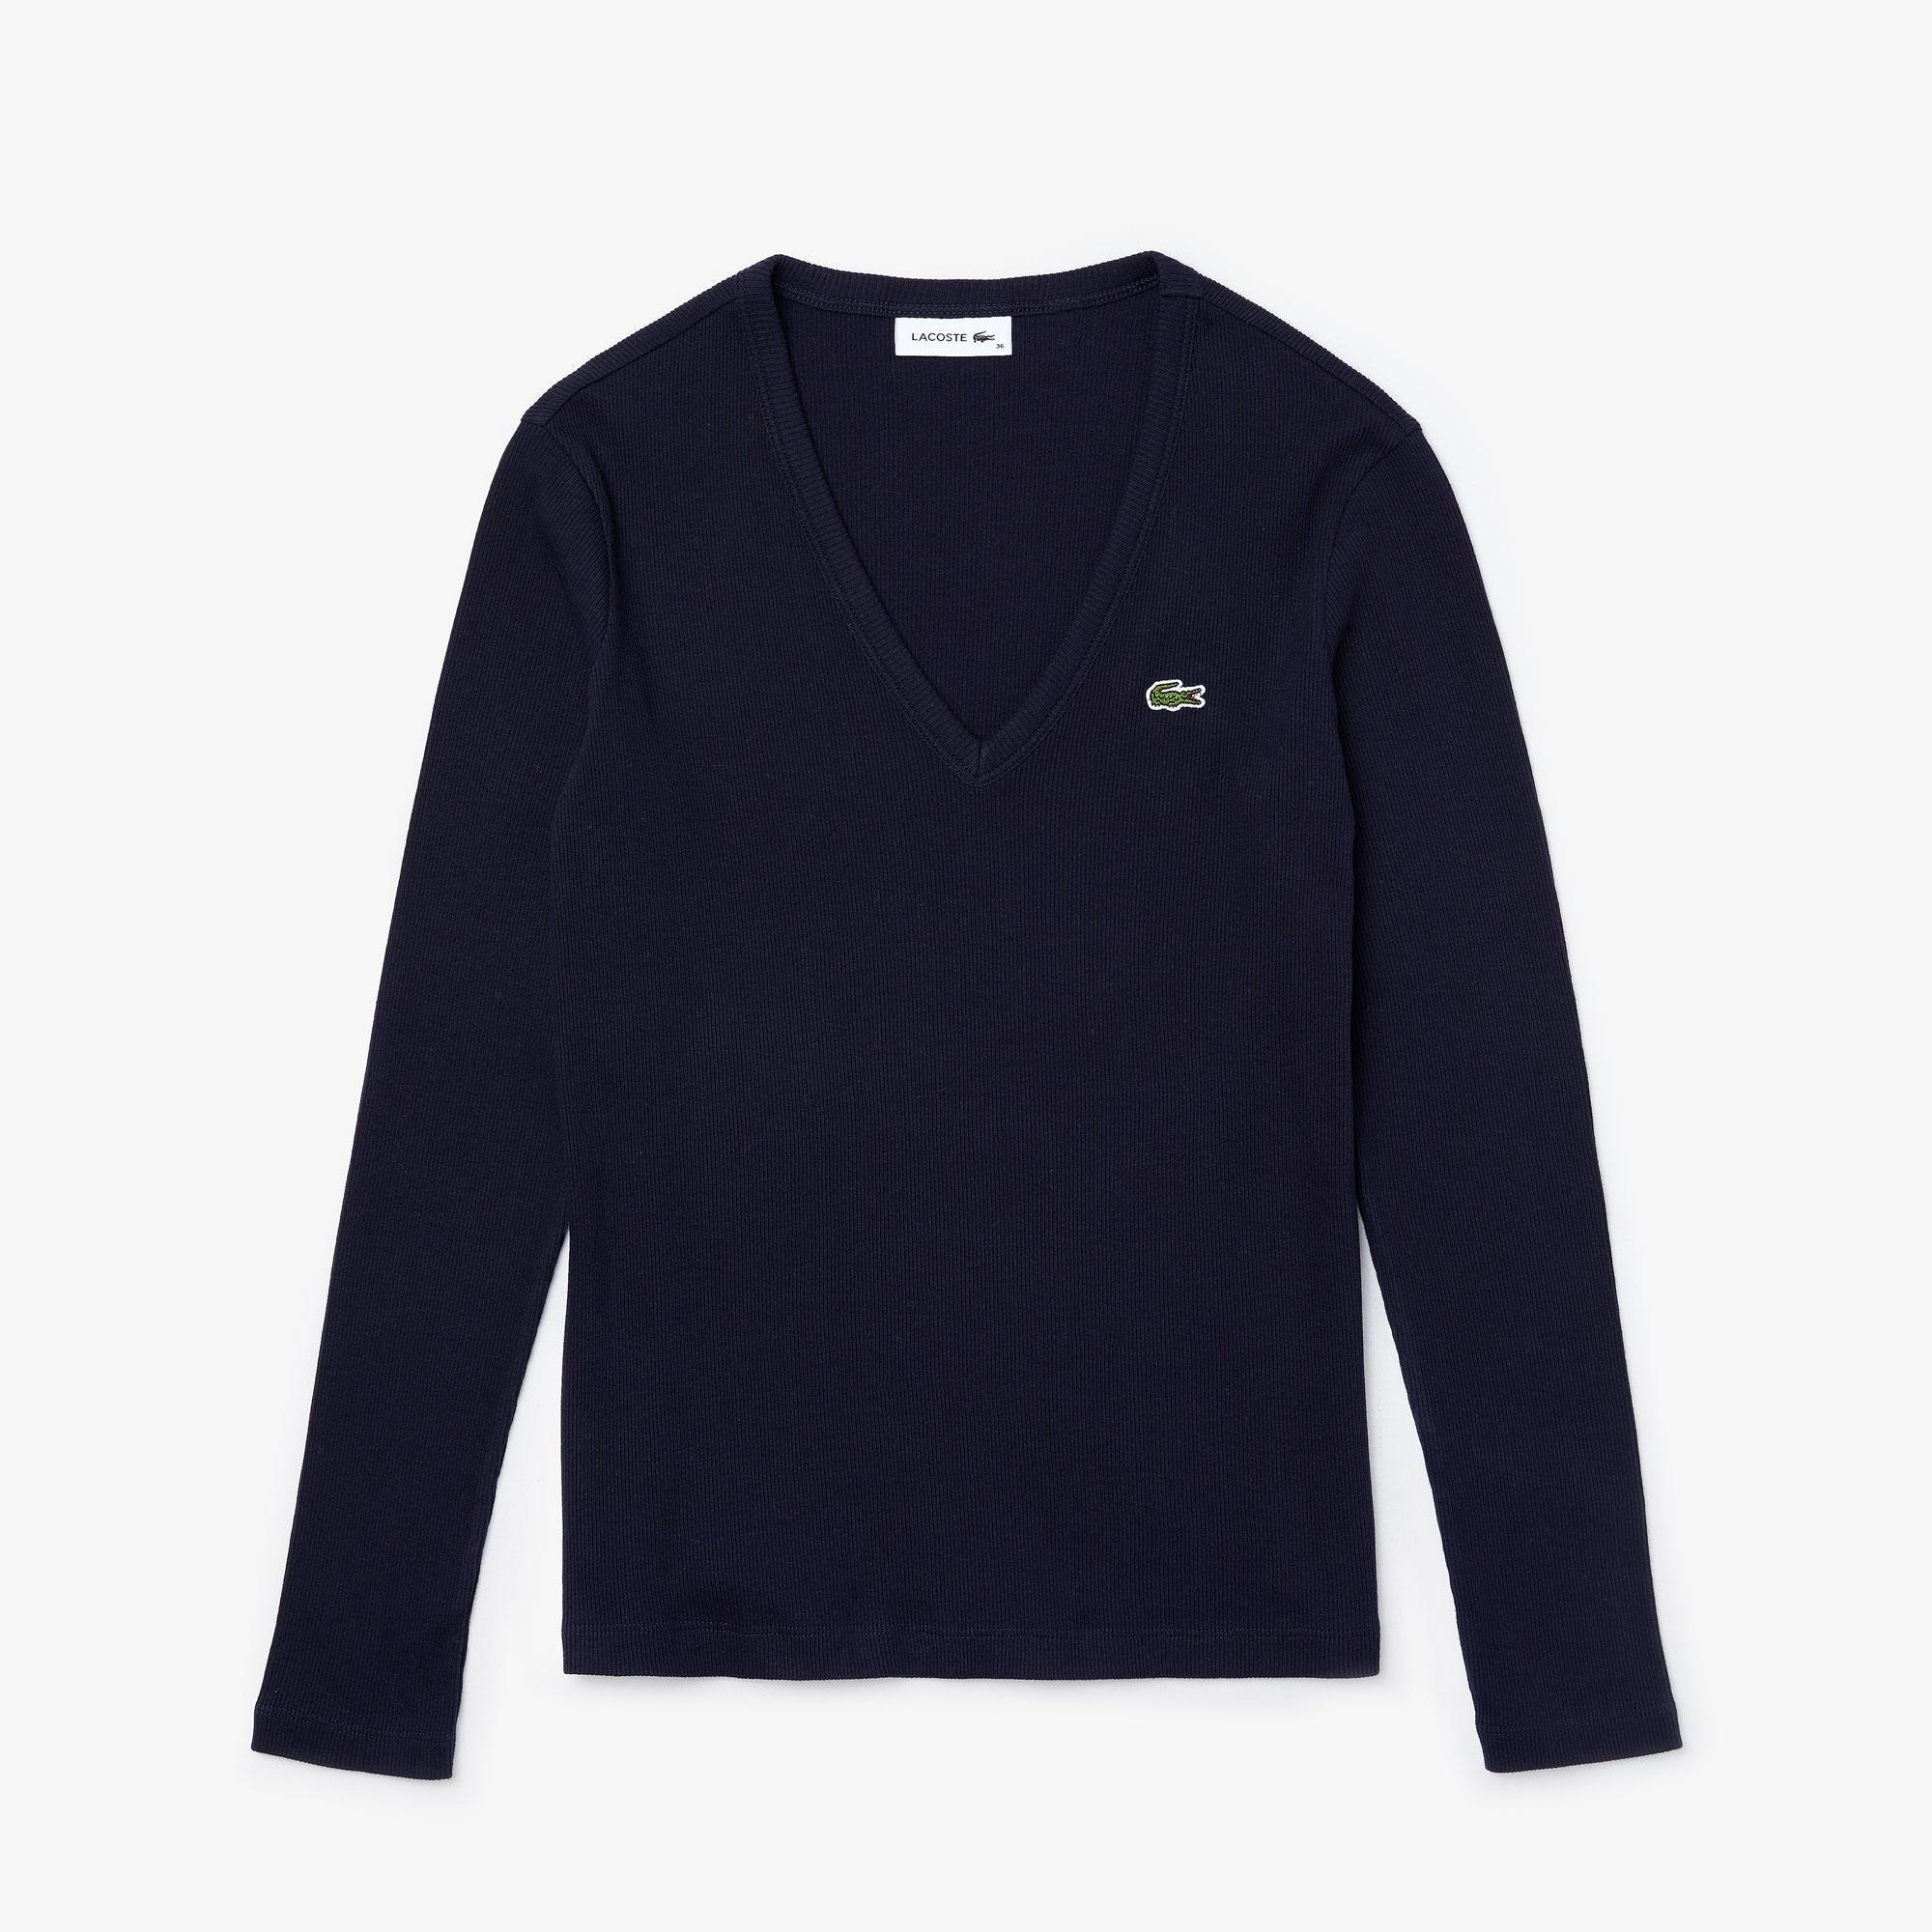 Lacoste Women's V-neck Ribbed Cotton T-shirt